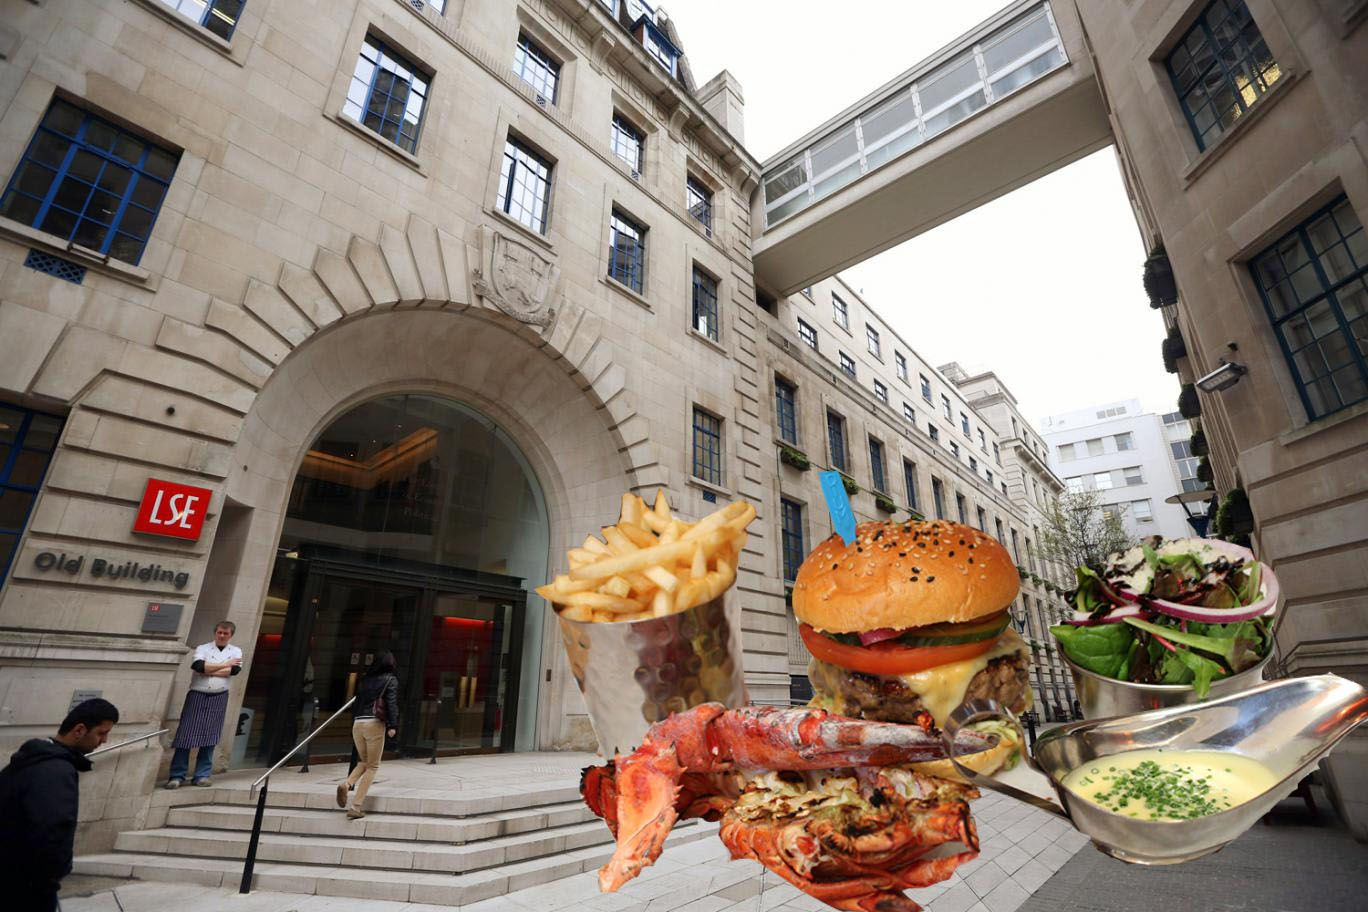 Image may contain: Patio, Fries, Balcony, Bowl, Seafood, Sea Life, King Crab, Invertebrate, Food, Crab, Animal